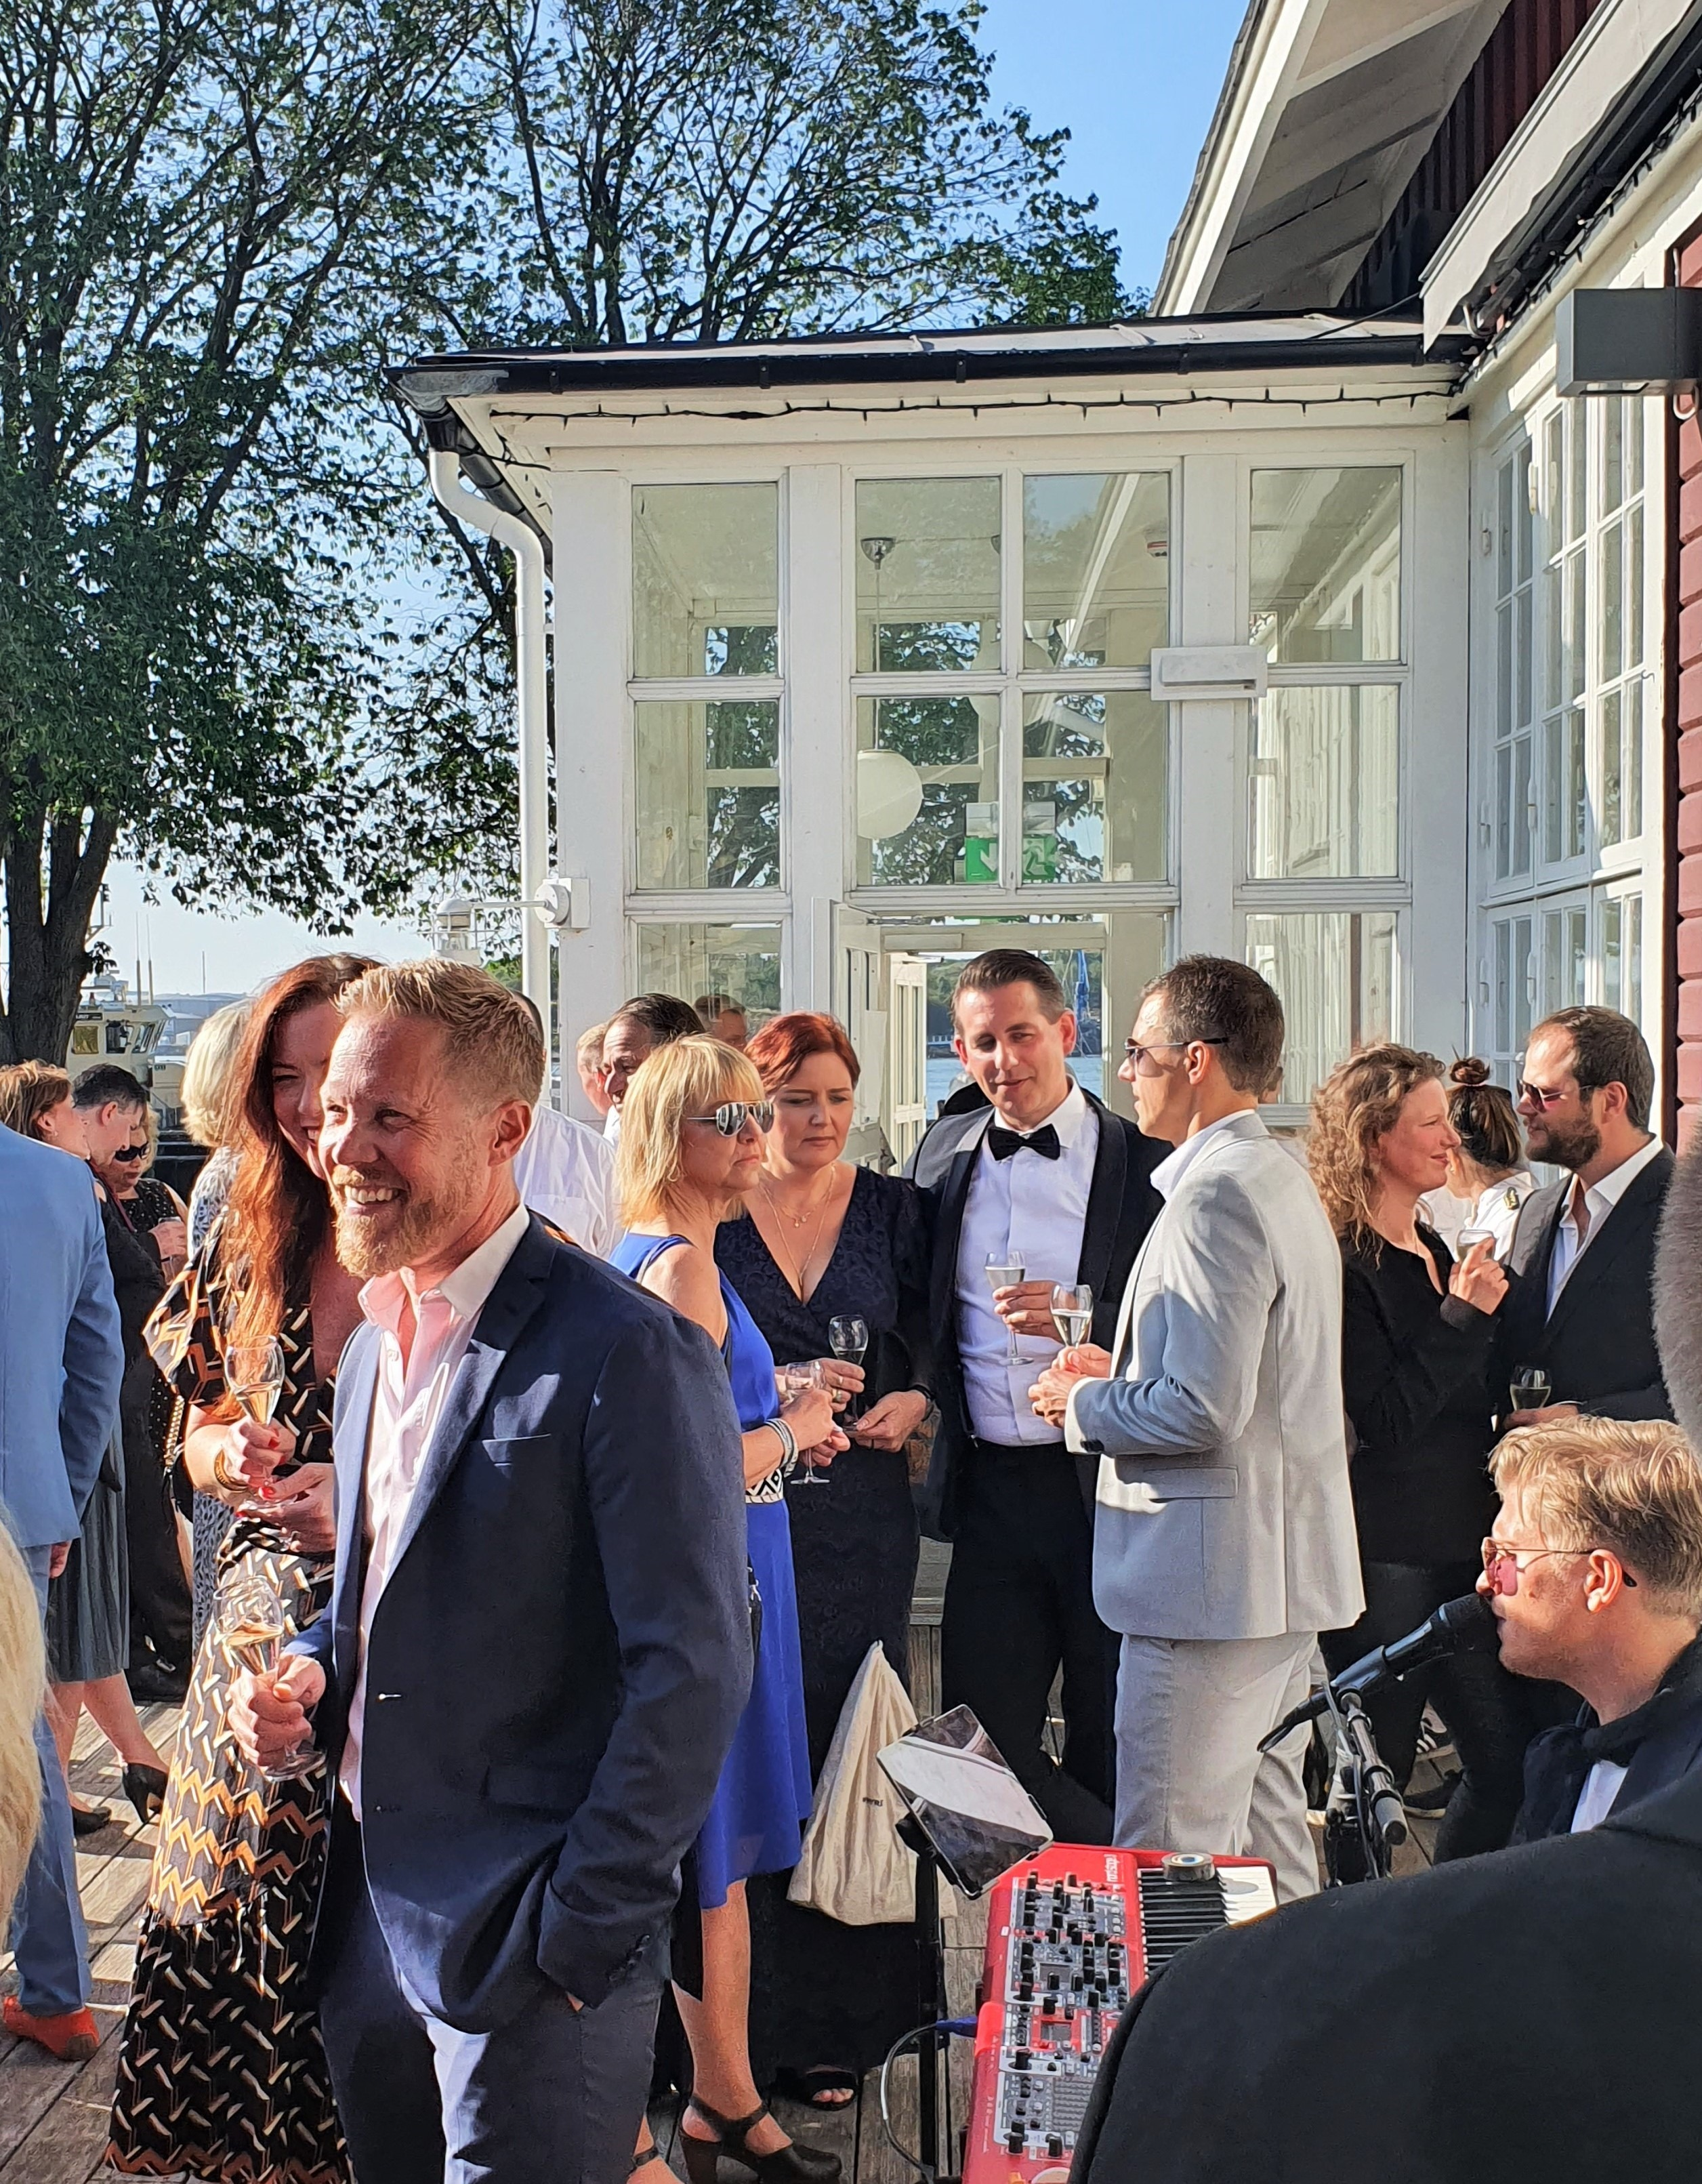 Sommarfest mingel, 2019, 20-årsjubileum på Elicit.